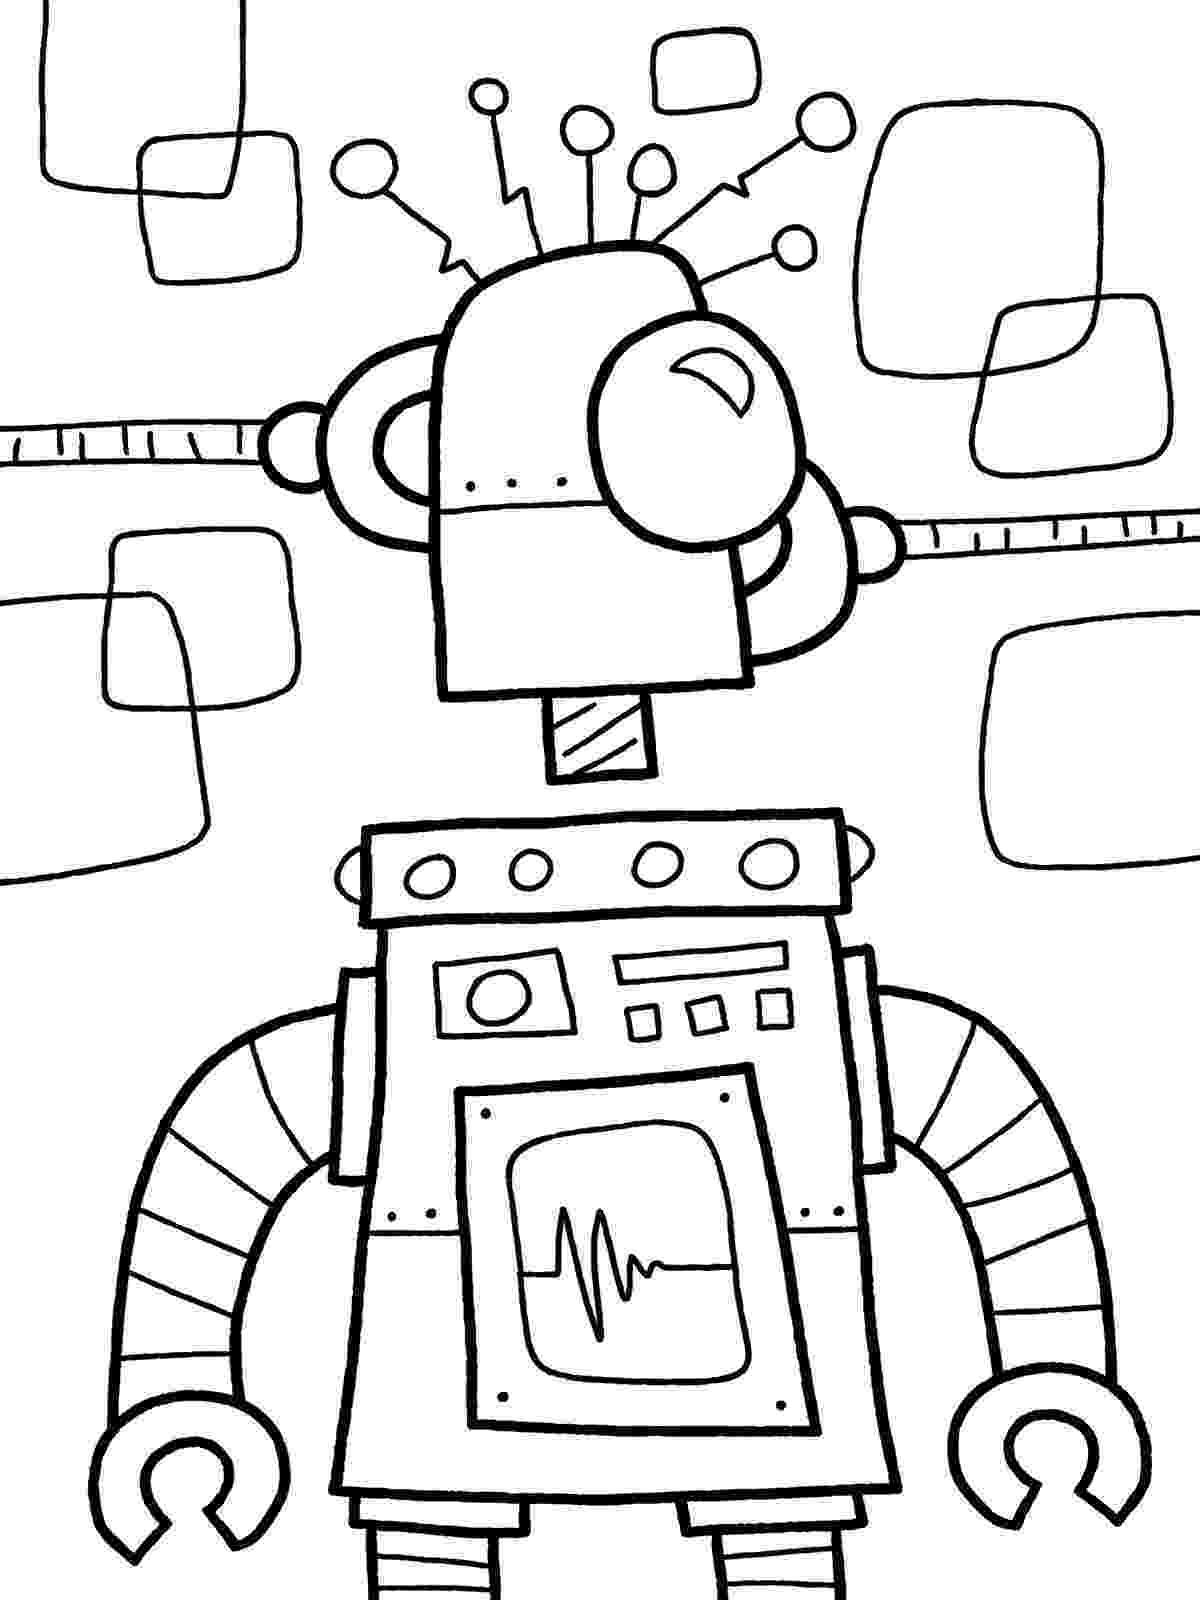 coloring page robot free printable robot coloring pages for kids robot coloring page